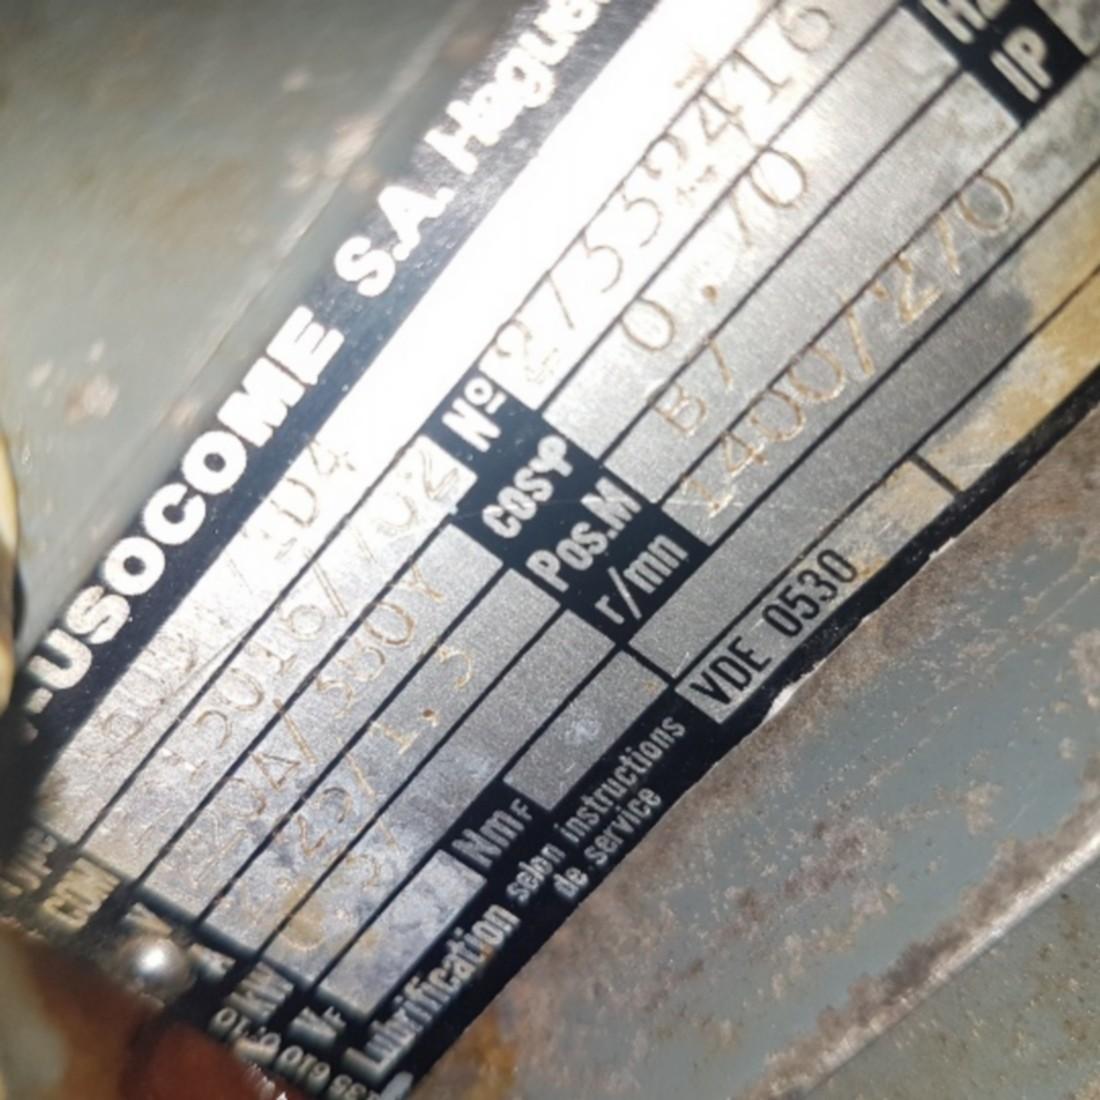 R6ME6391 Stainless steel ASTOR mixer - 40 liters - Hp3